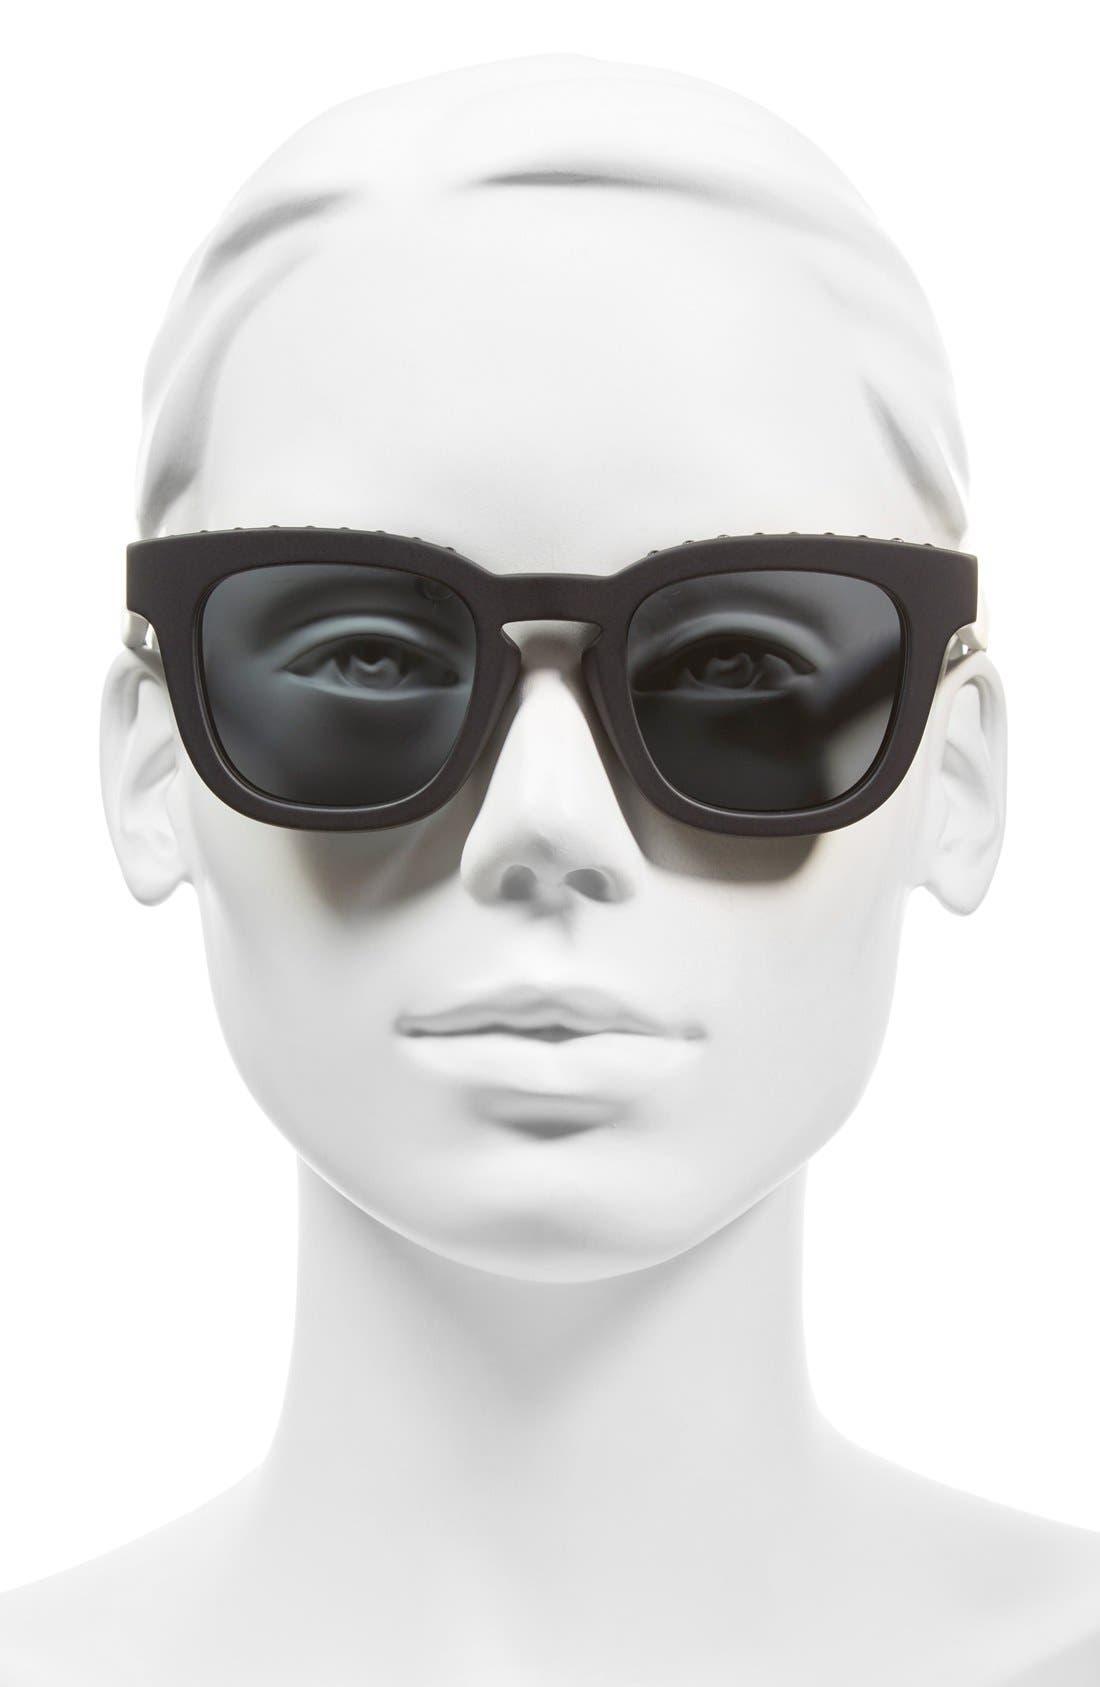 48mm Sunglasses,                             Alternate thumbnail 2, color,                             001